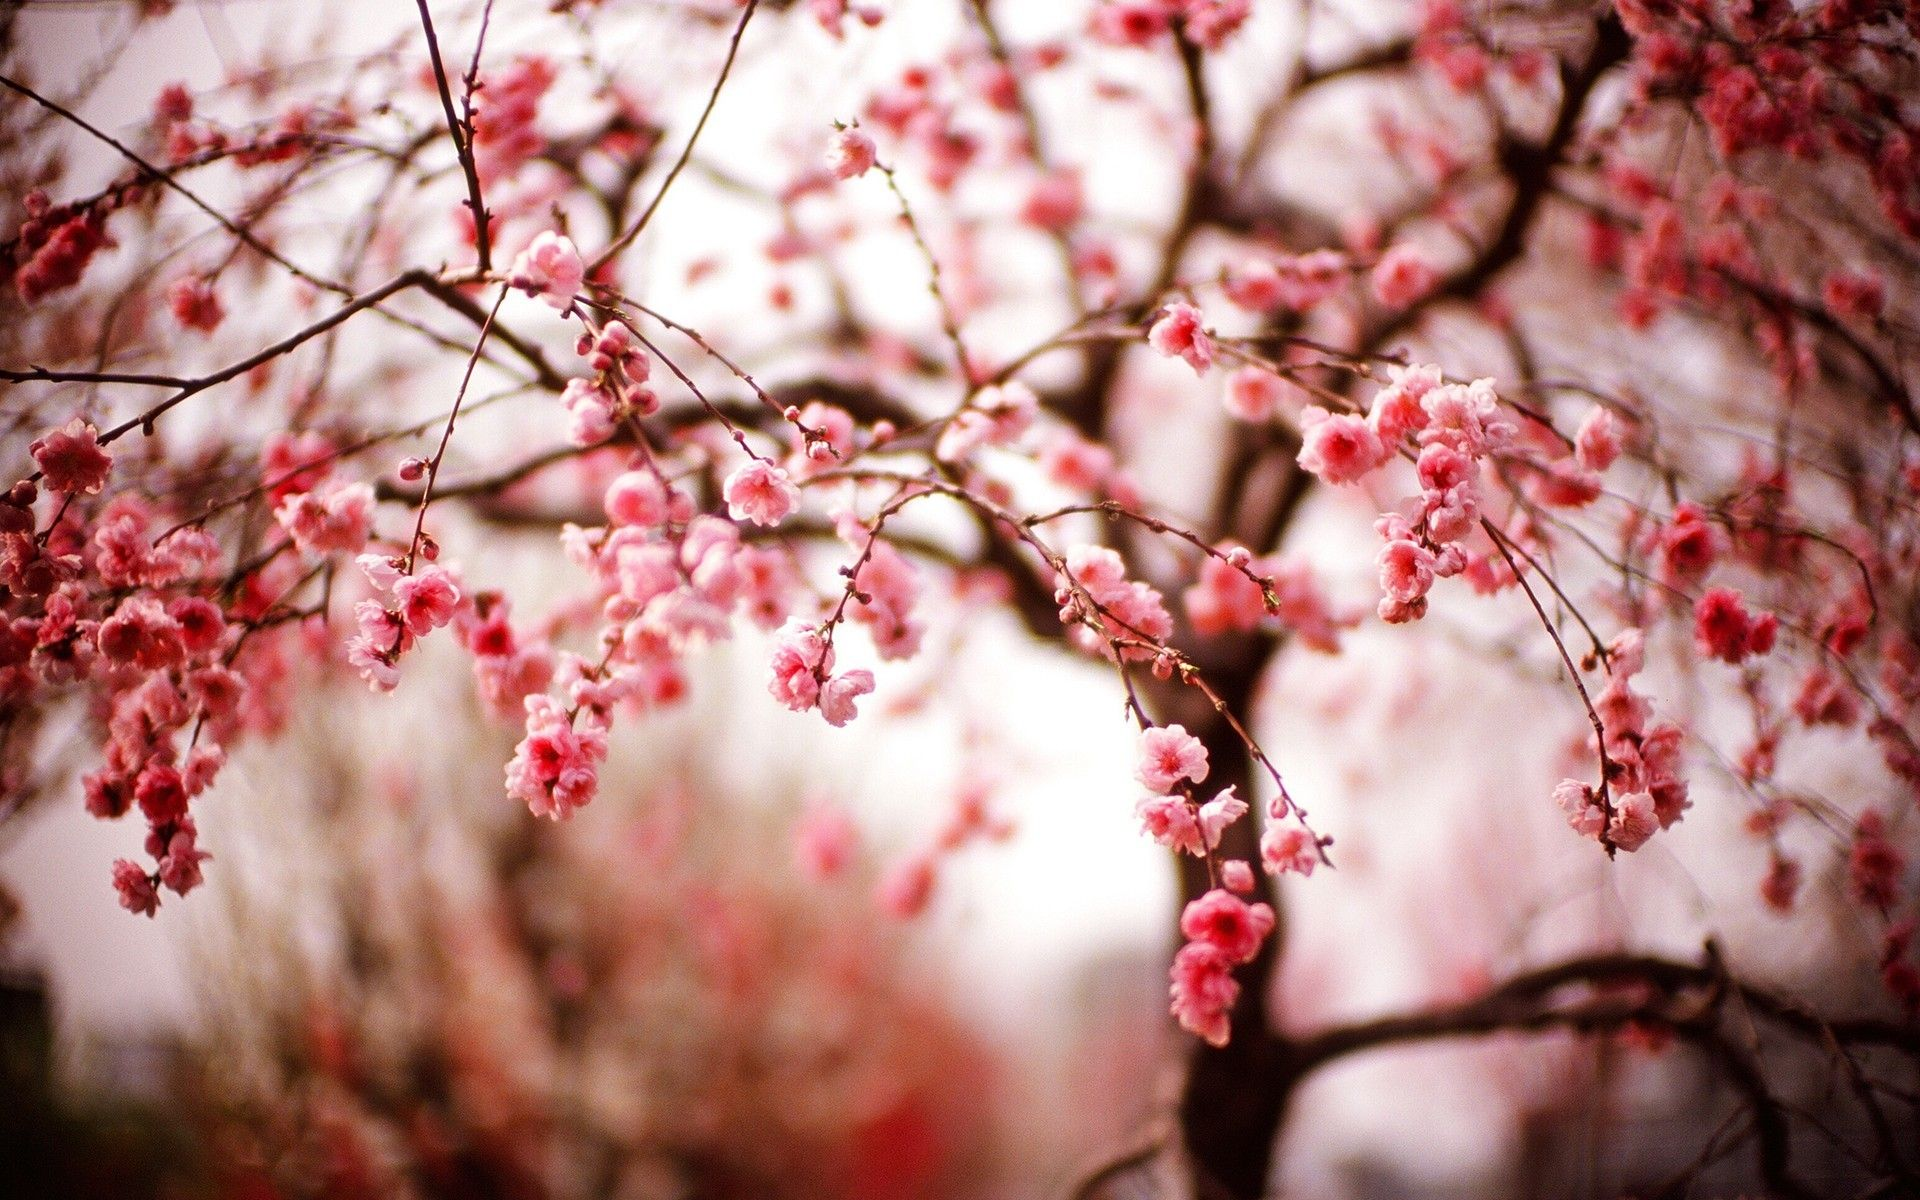 Great Wallpaper Night Cherry Blossom - 012fad0b407ee0cf5e0a655ca19b64f1  You Should Have.jpg